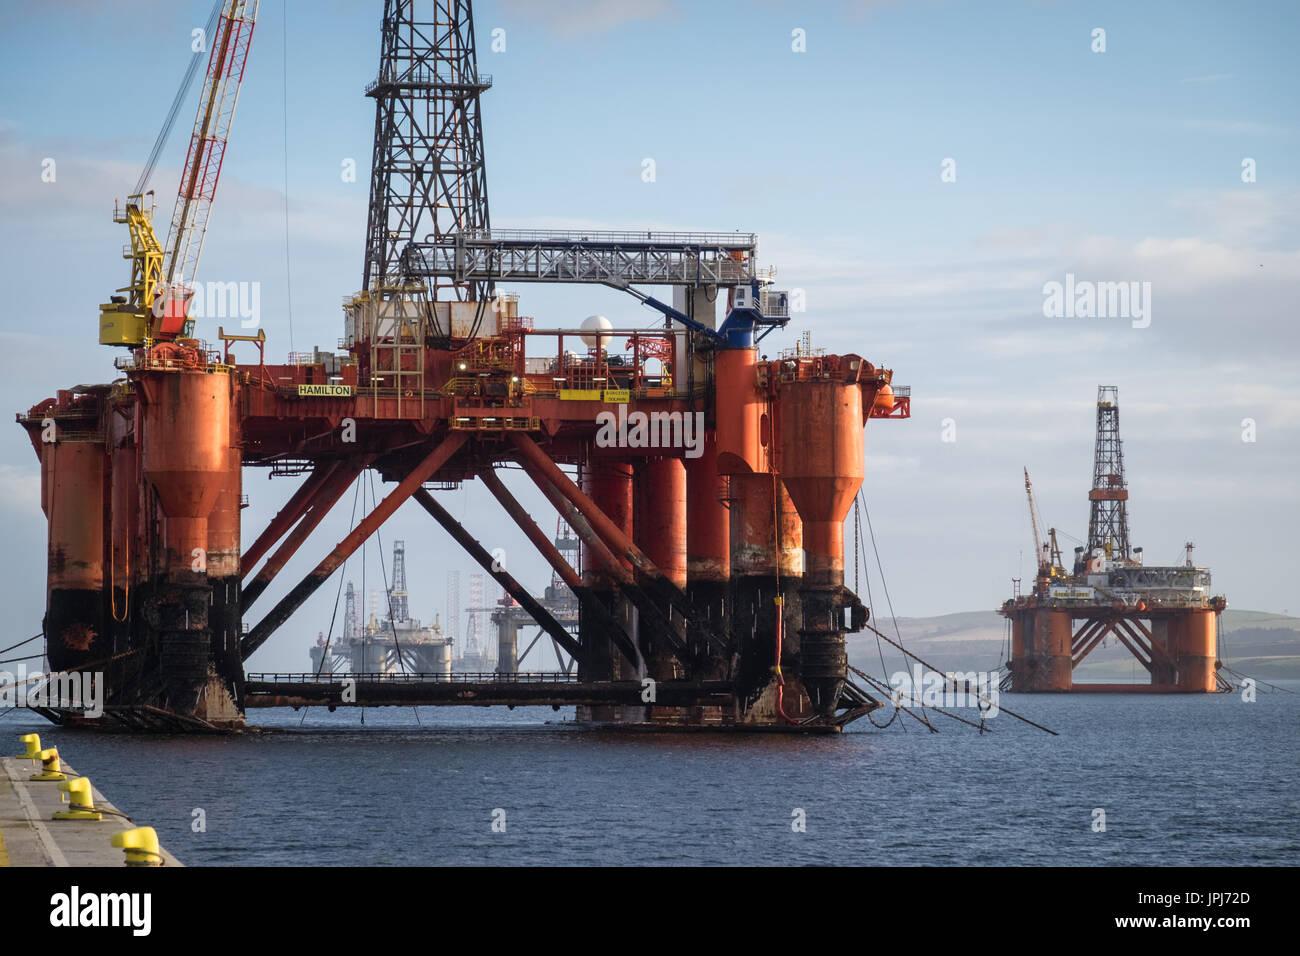 The drilling platform, Borgsten Dolphin, moored in the Scottish port of Invergordon - Stock Image